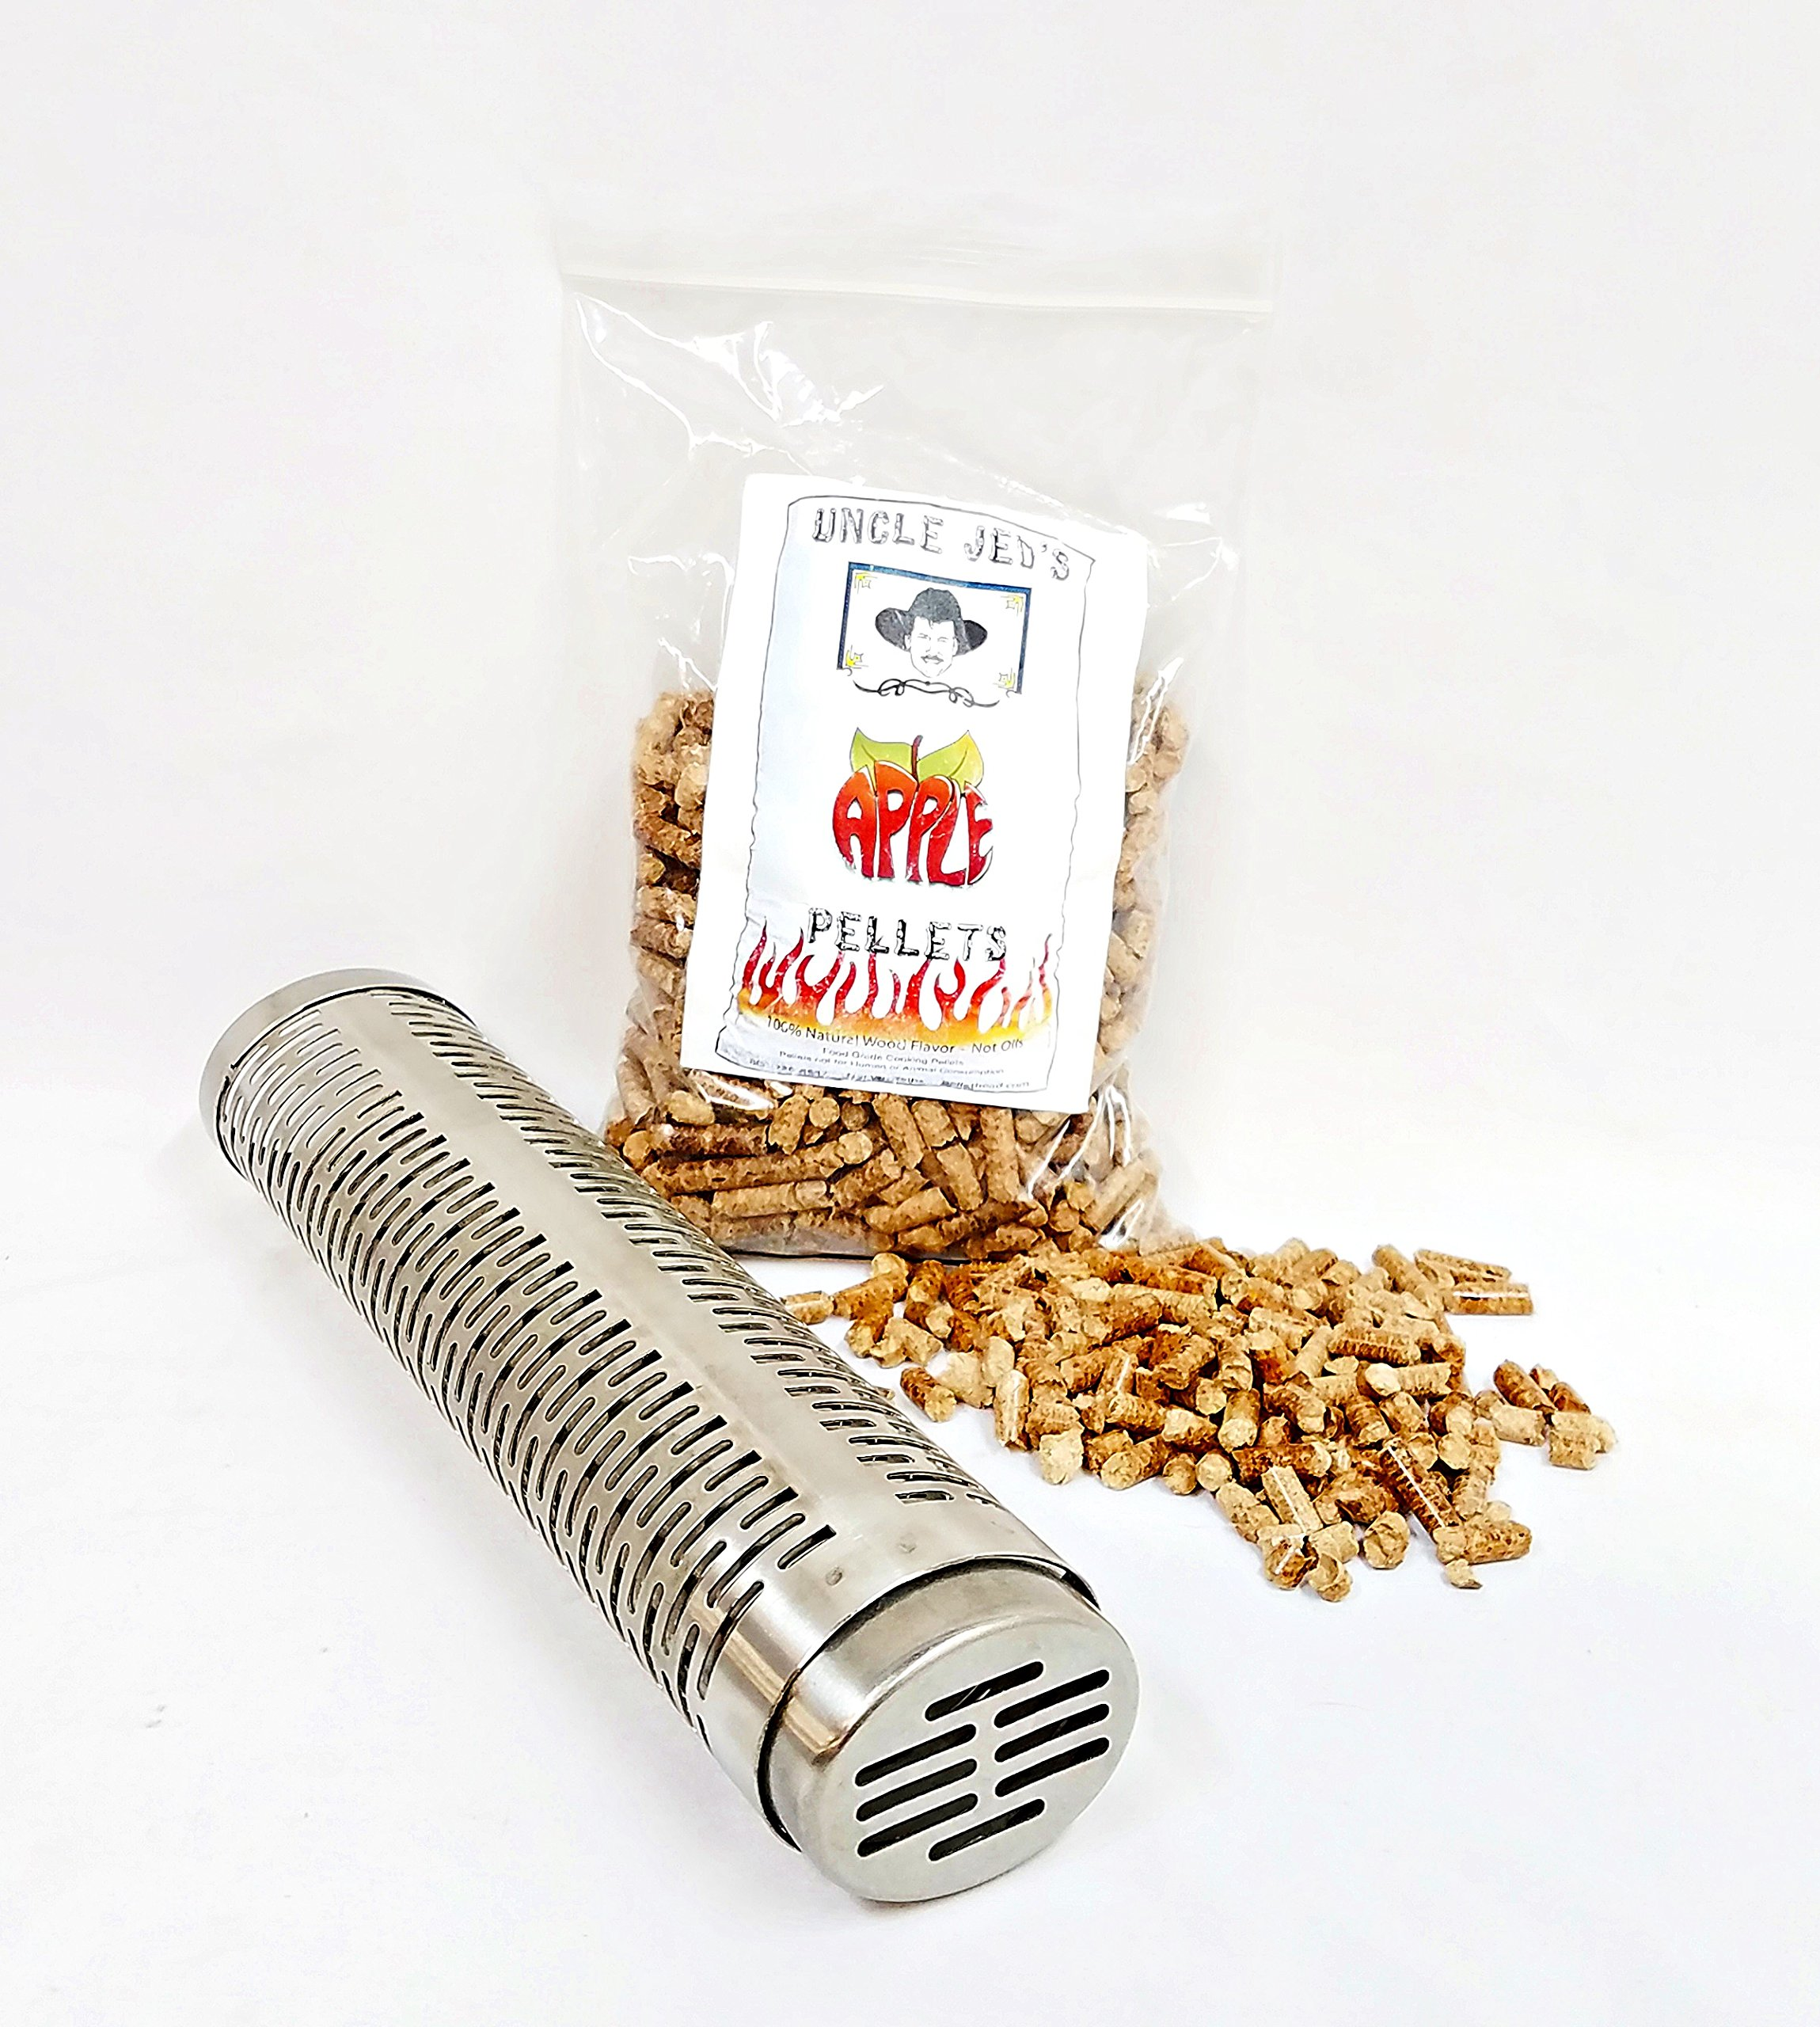 BBQ GRILL SMOKE TUBE KIT - Gas, Charcoal, Propane, Wood Pellet Smoker + 1LB SAMPLE PELLETS GMG-6027 by Green Mountain Grills